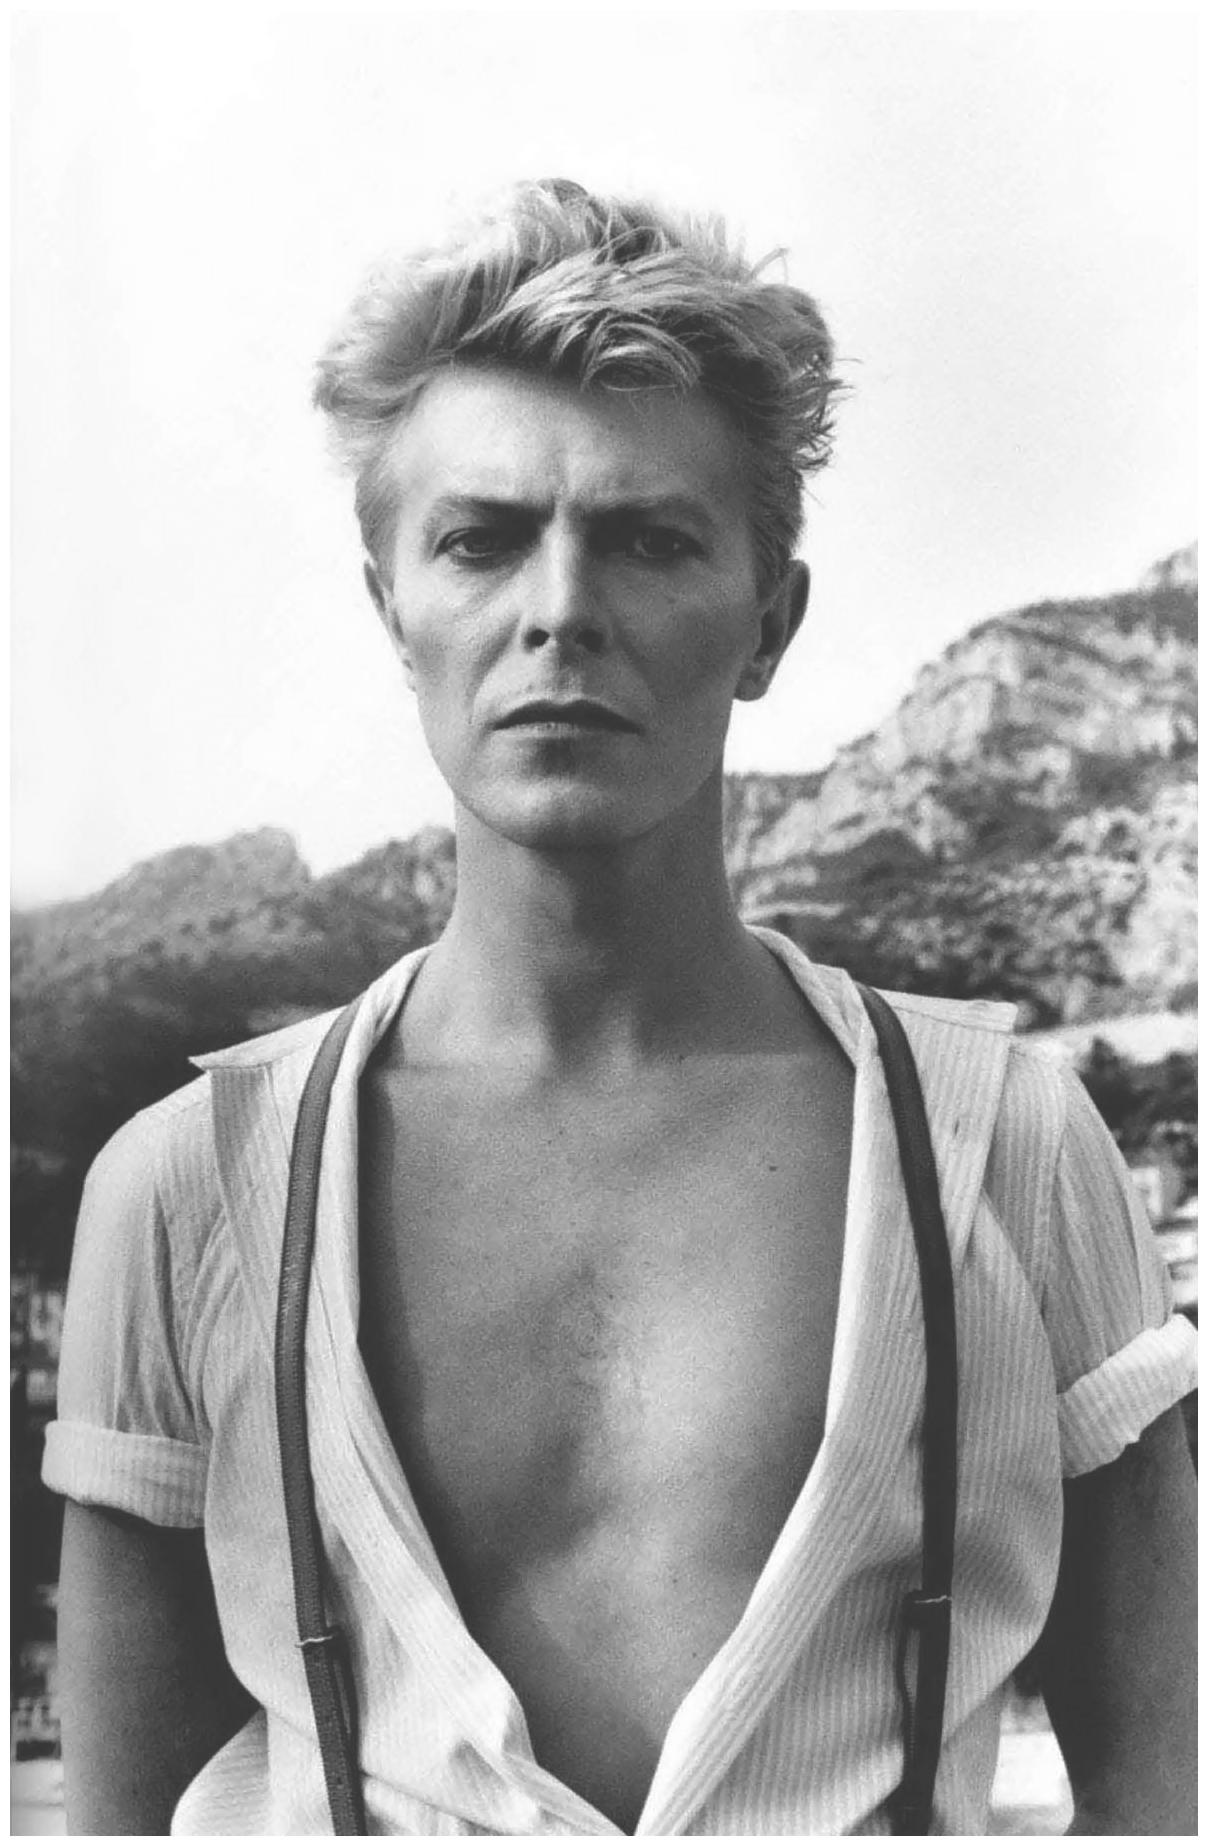 david-bowie-helmut-newton-1983